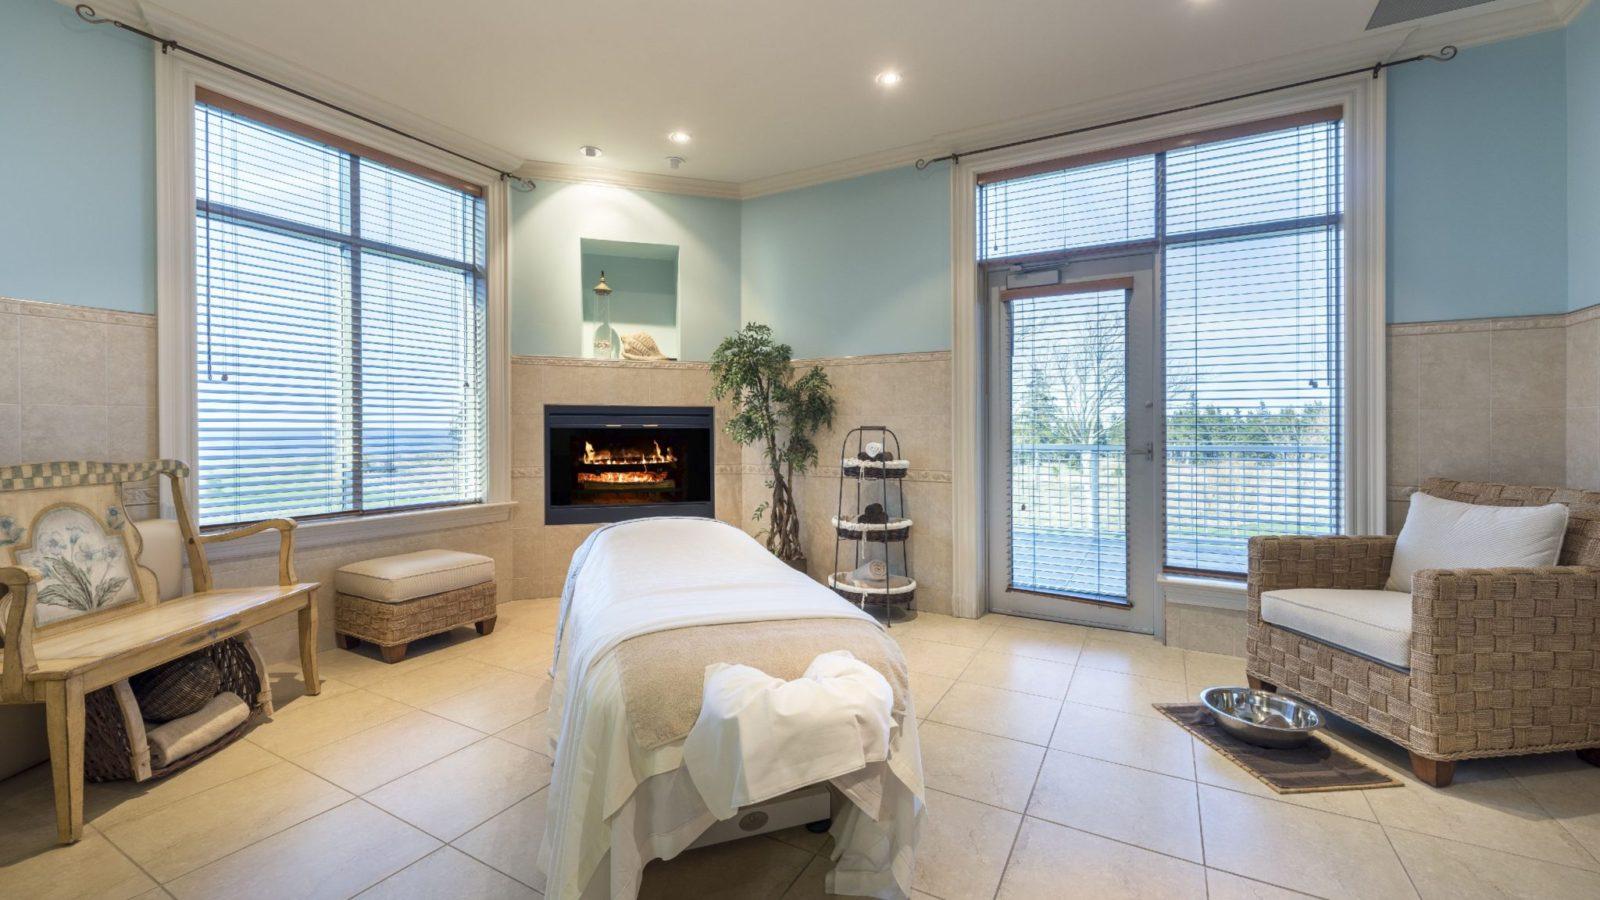 fox-harbr-resort-spa-treatment-room_38171529295_o